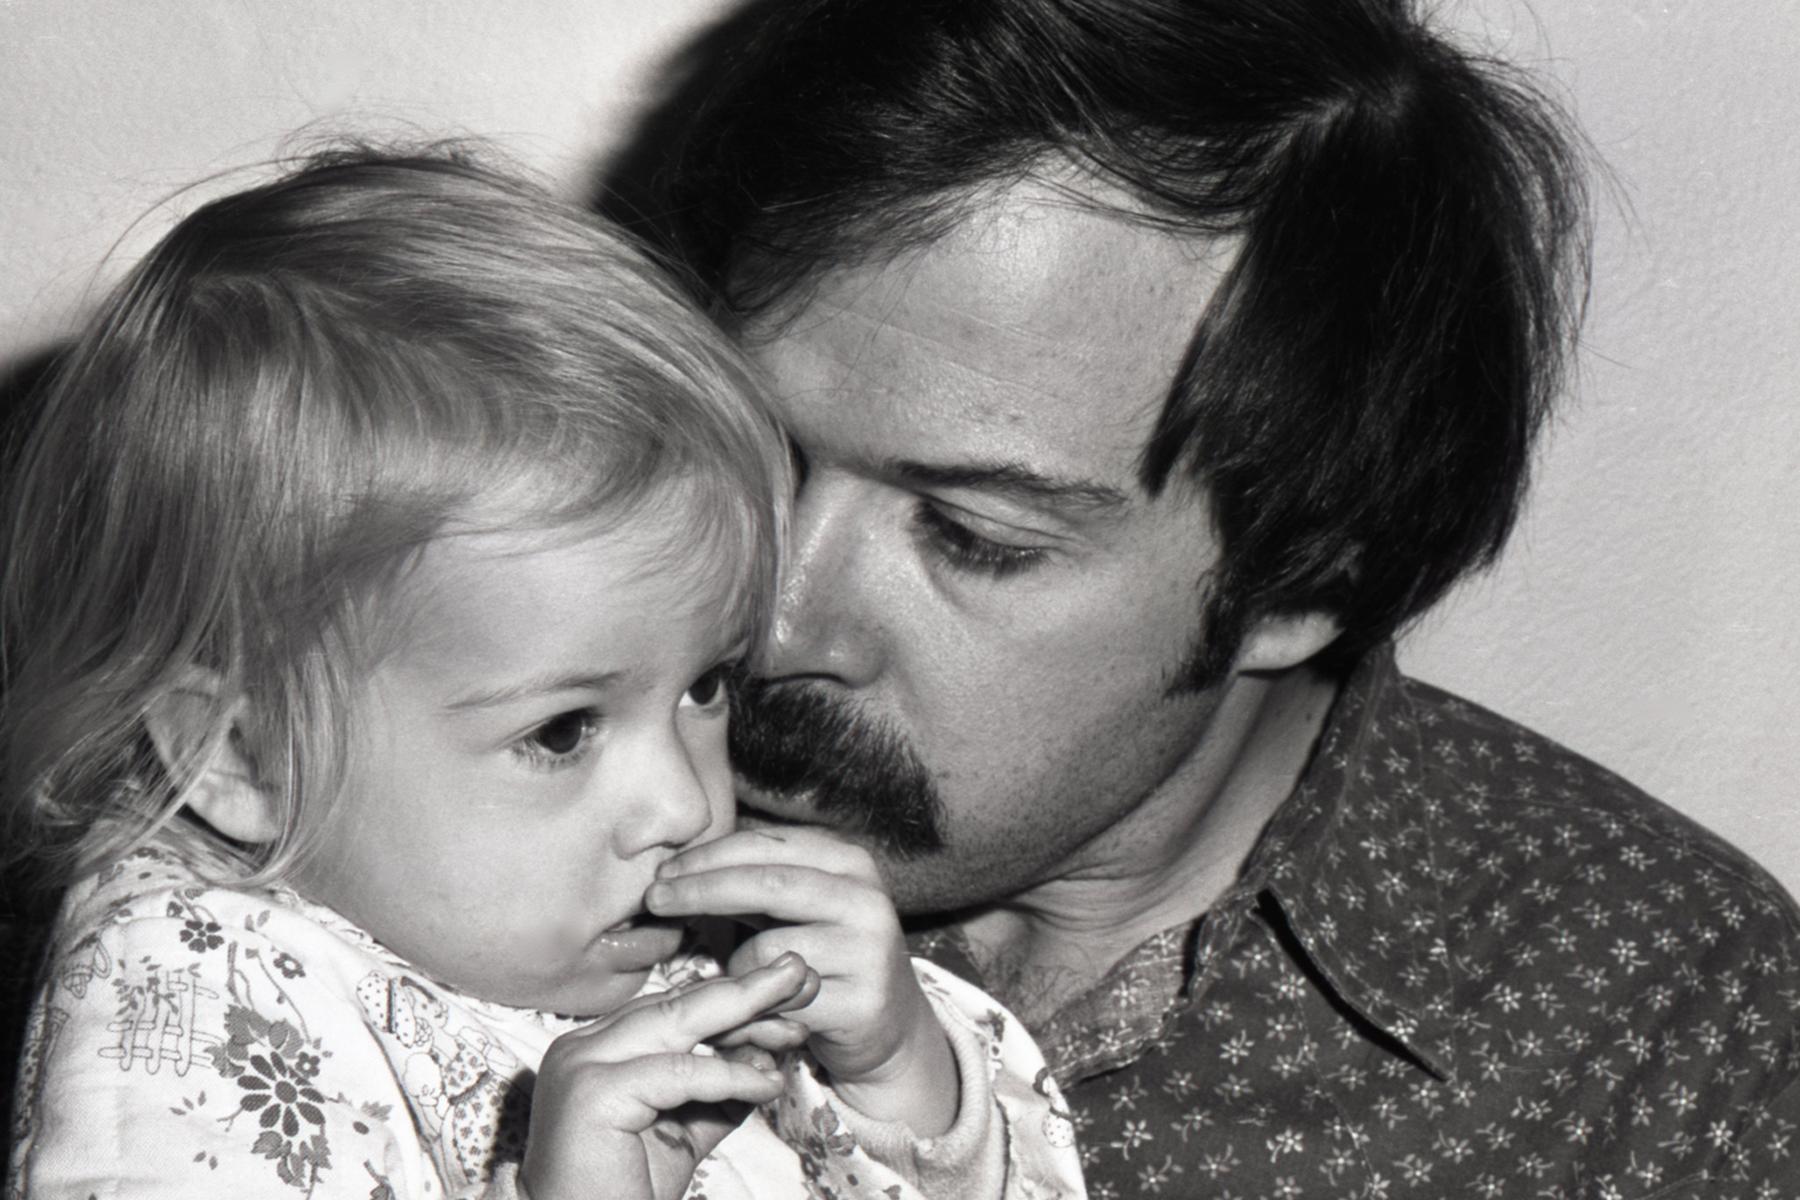 '76 Alison, Self Portrait with Alison Cardiff, Md